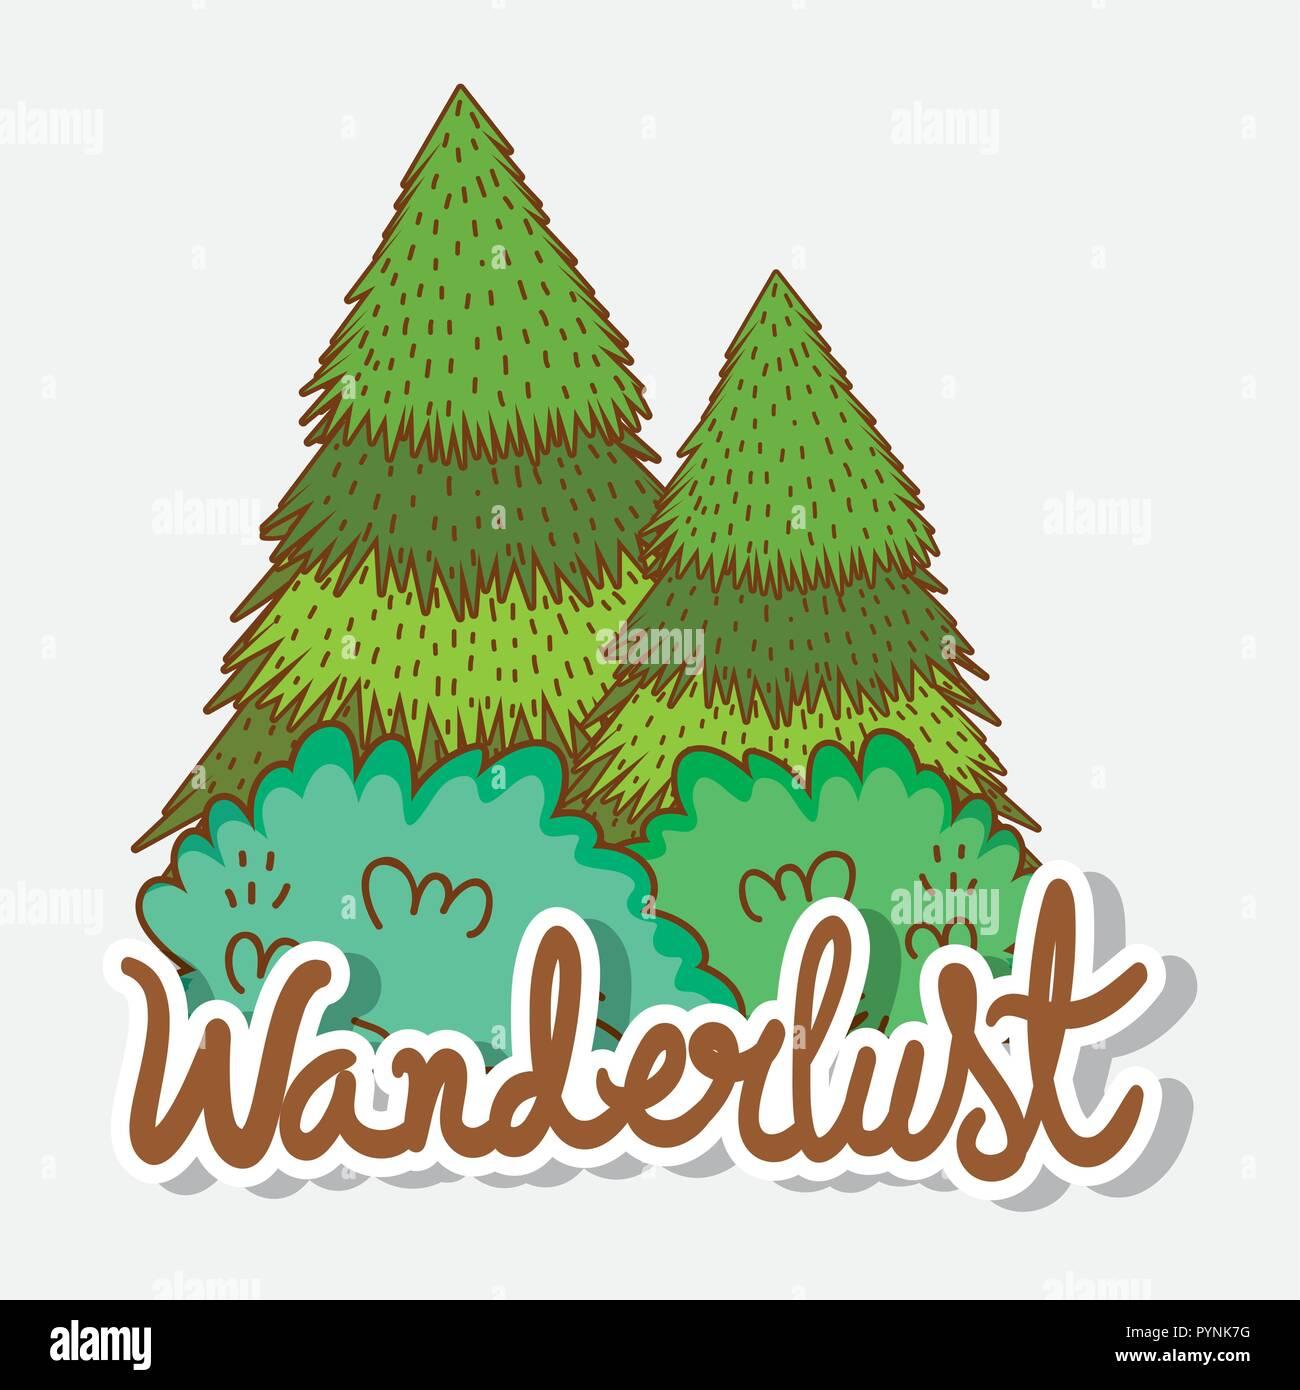 nature trees to wanderlust explore adventure - Stock Vector